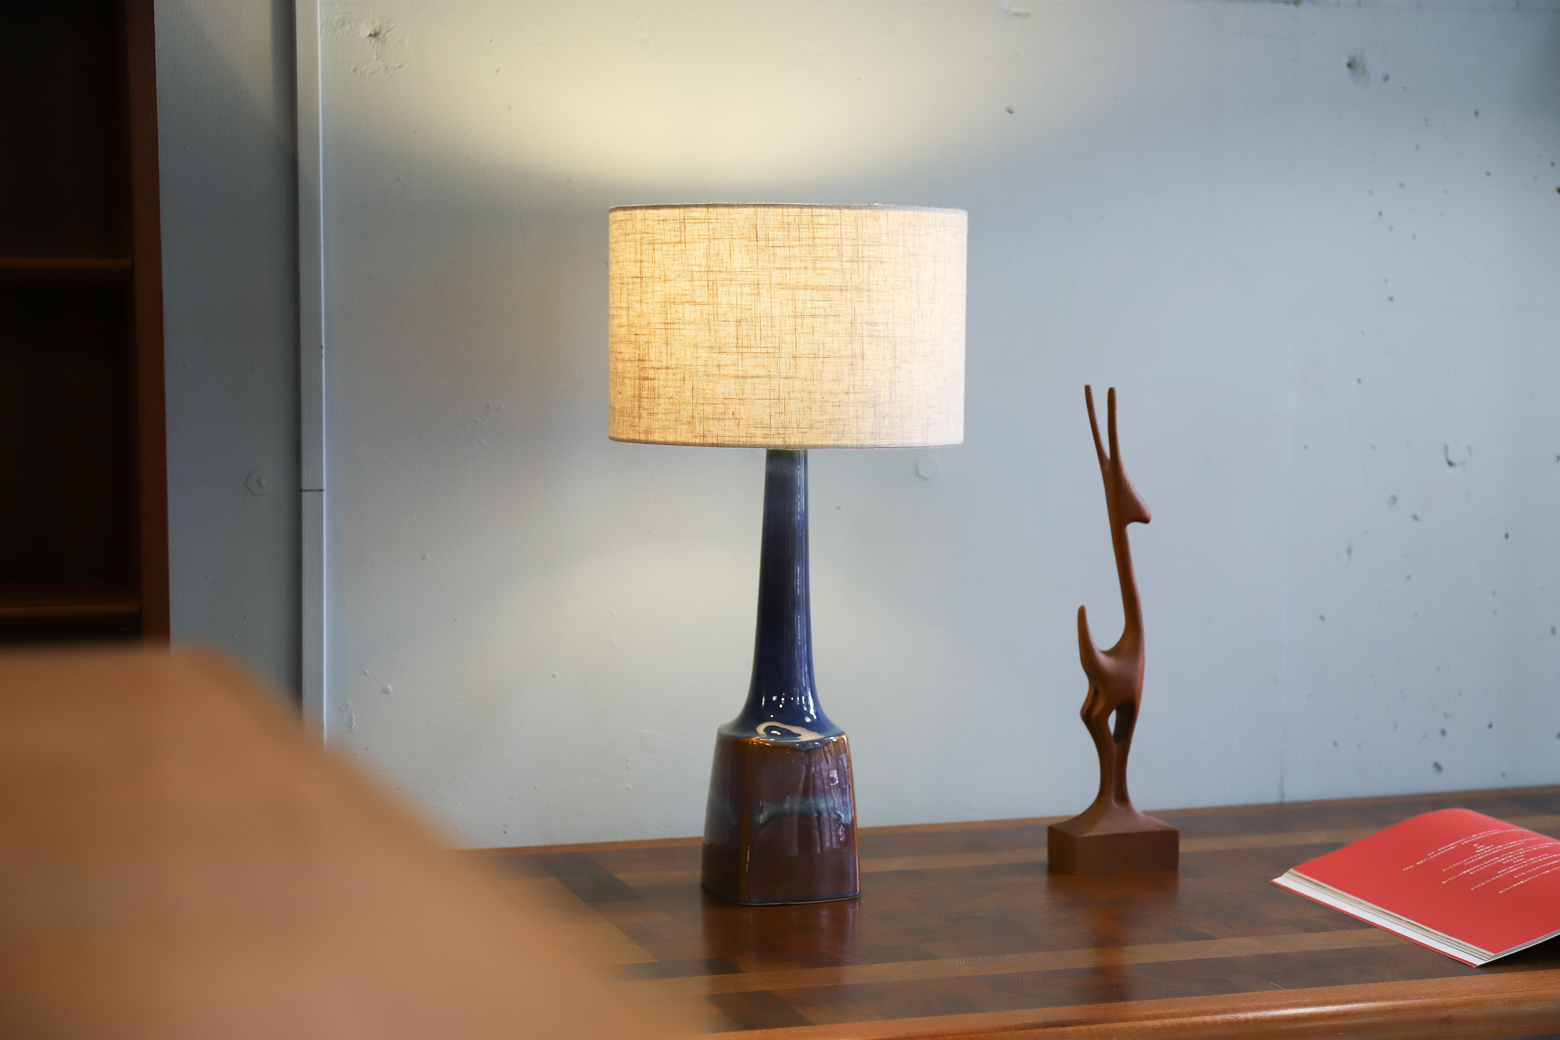 Soholm Table Lamp Danish Vintage/スーホルム テーブルランプ デンマーク ヴィンテージ 照明 北欧インテリア